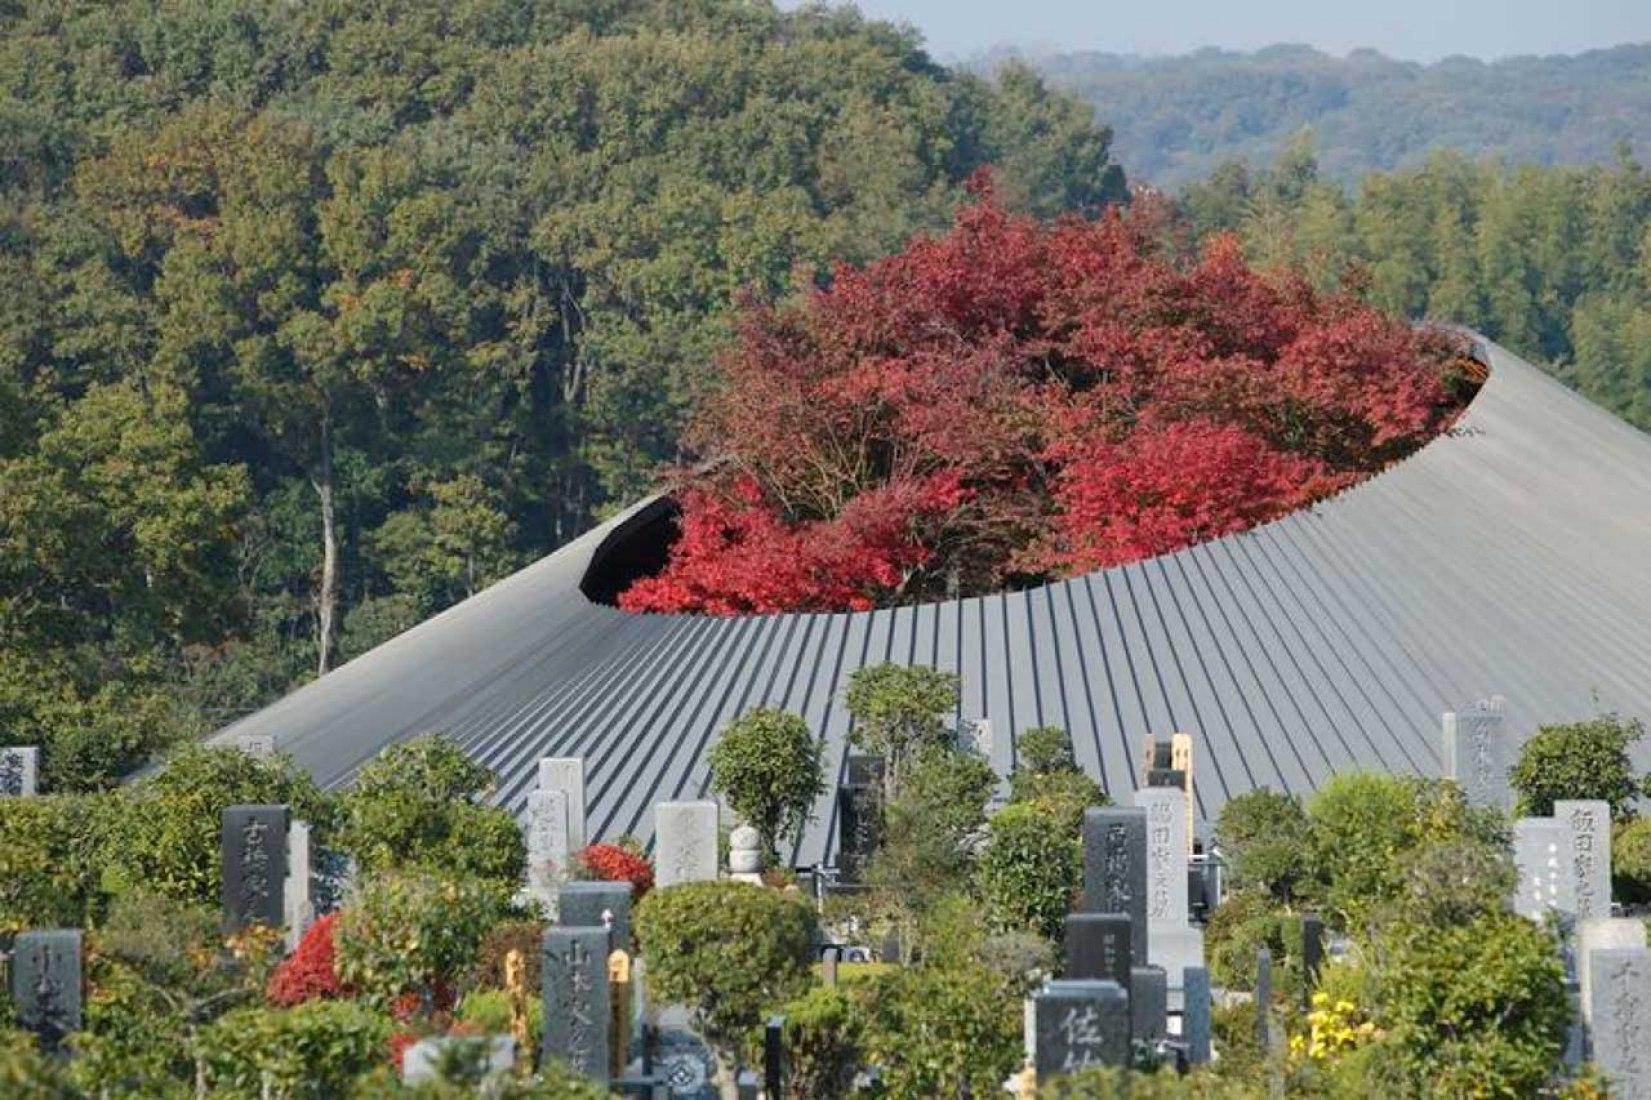 Centro Comunitario en el Cementerio Sayama Lakeside por Hiroshi Nakamura & NAP. Fotografía @ Koji Fujii / Nacasa and Partners.